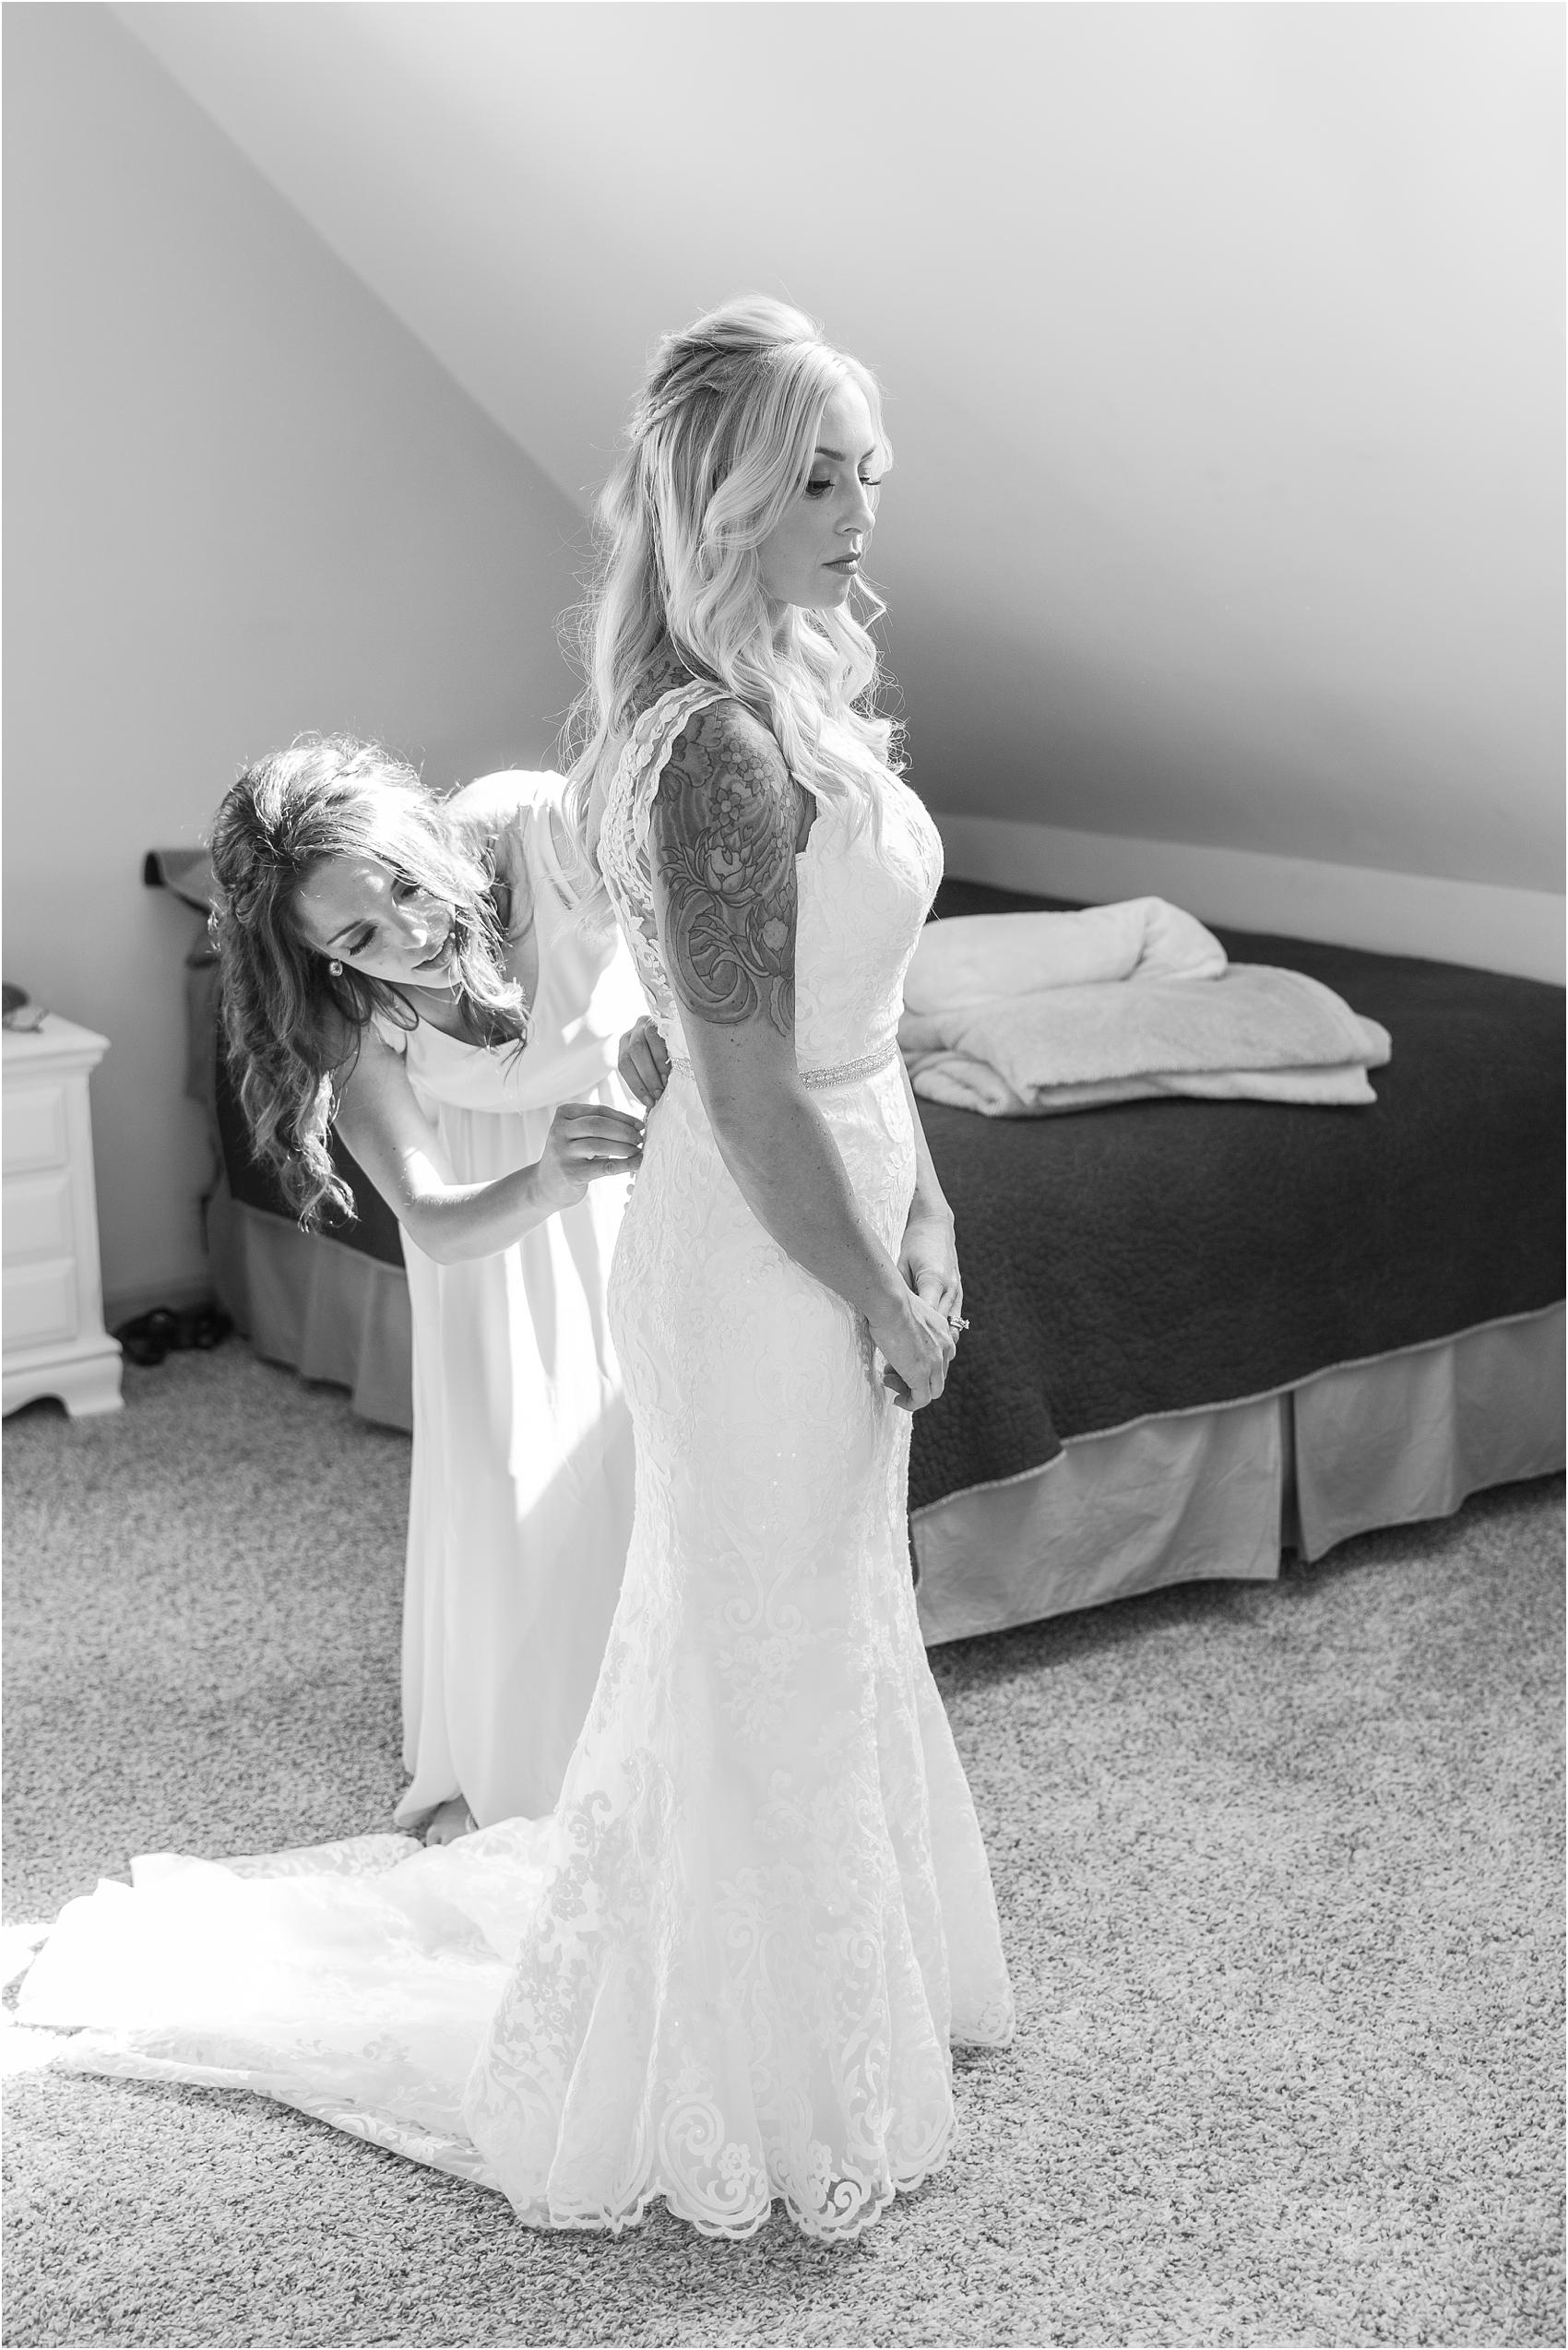 fun-whimsical-beach-wedding-photos-in-st-joseph-michigan-by-courtney-carolyn-photography_0010.jpg